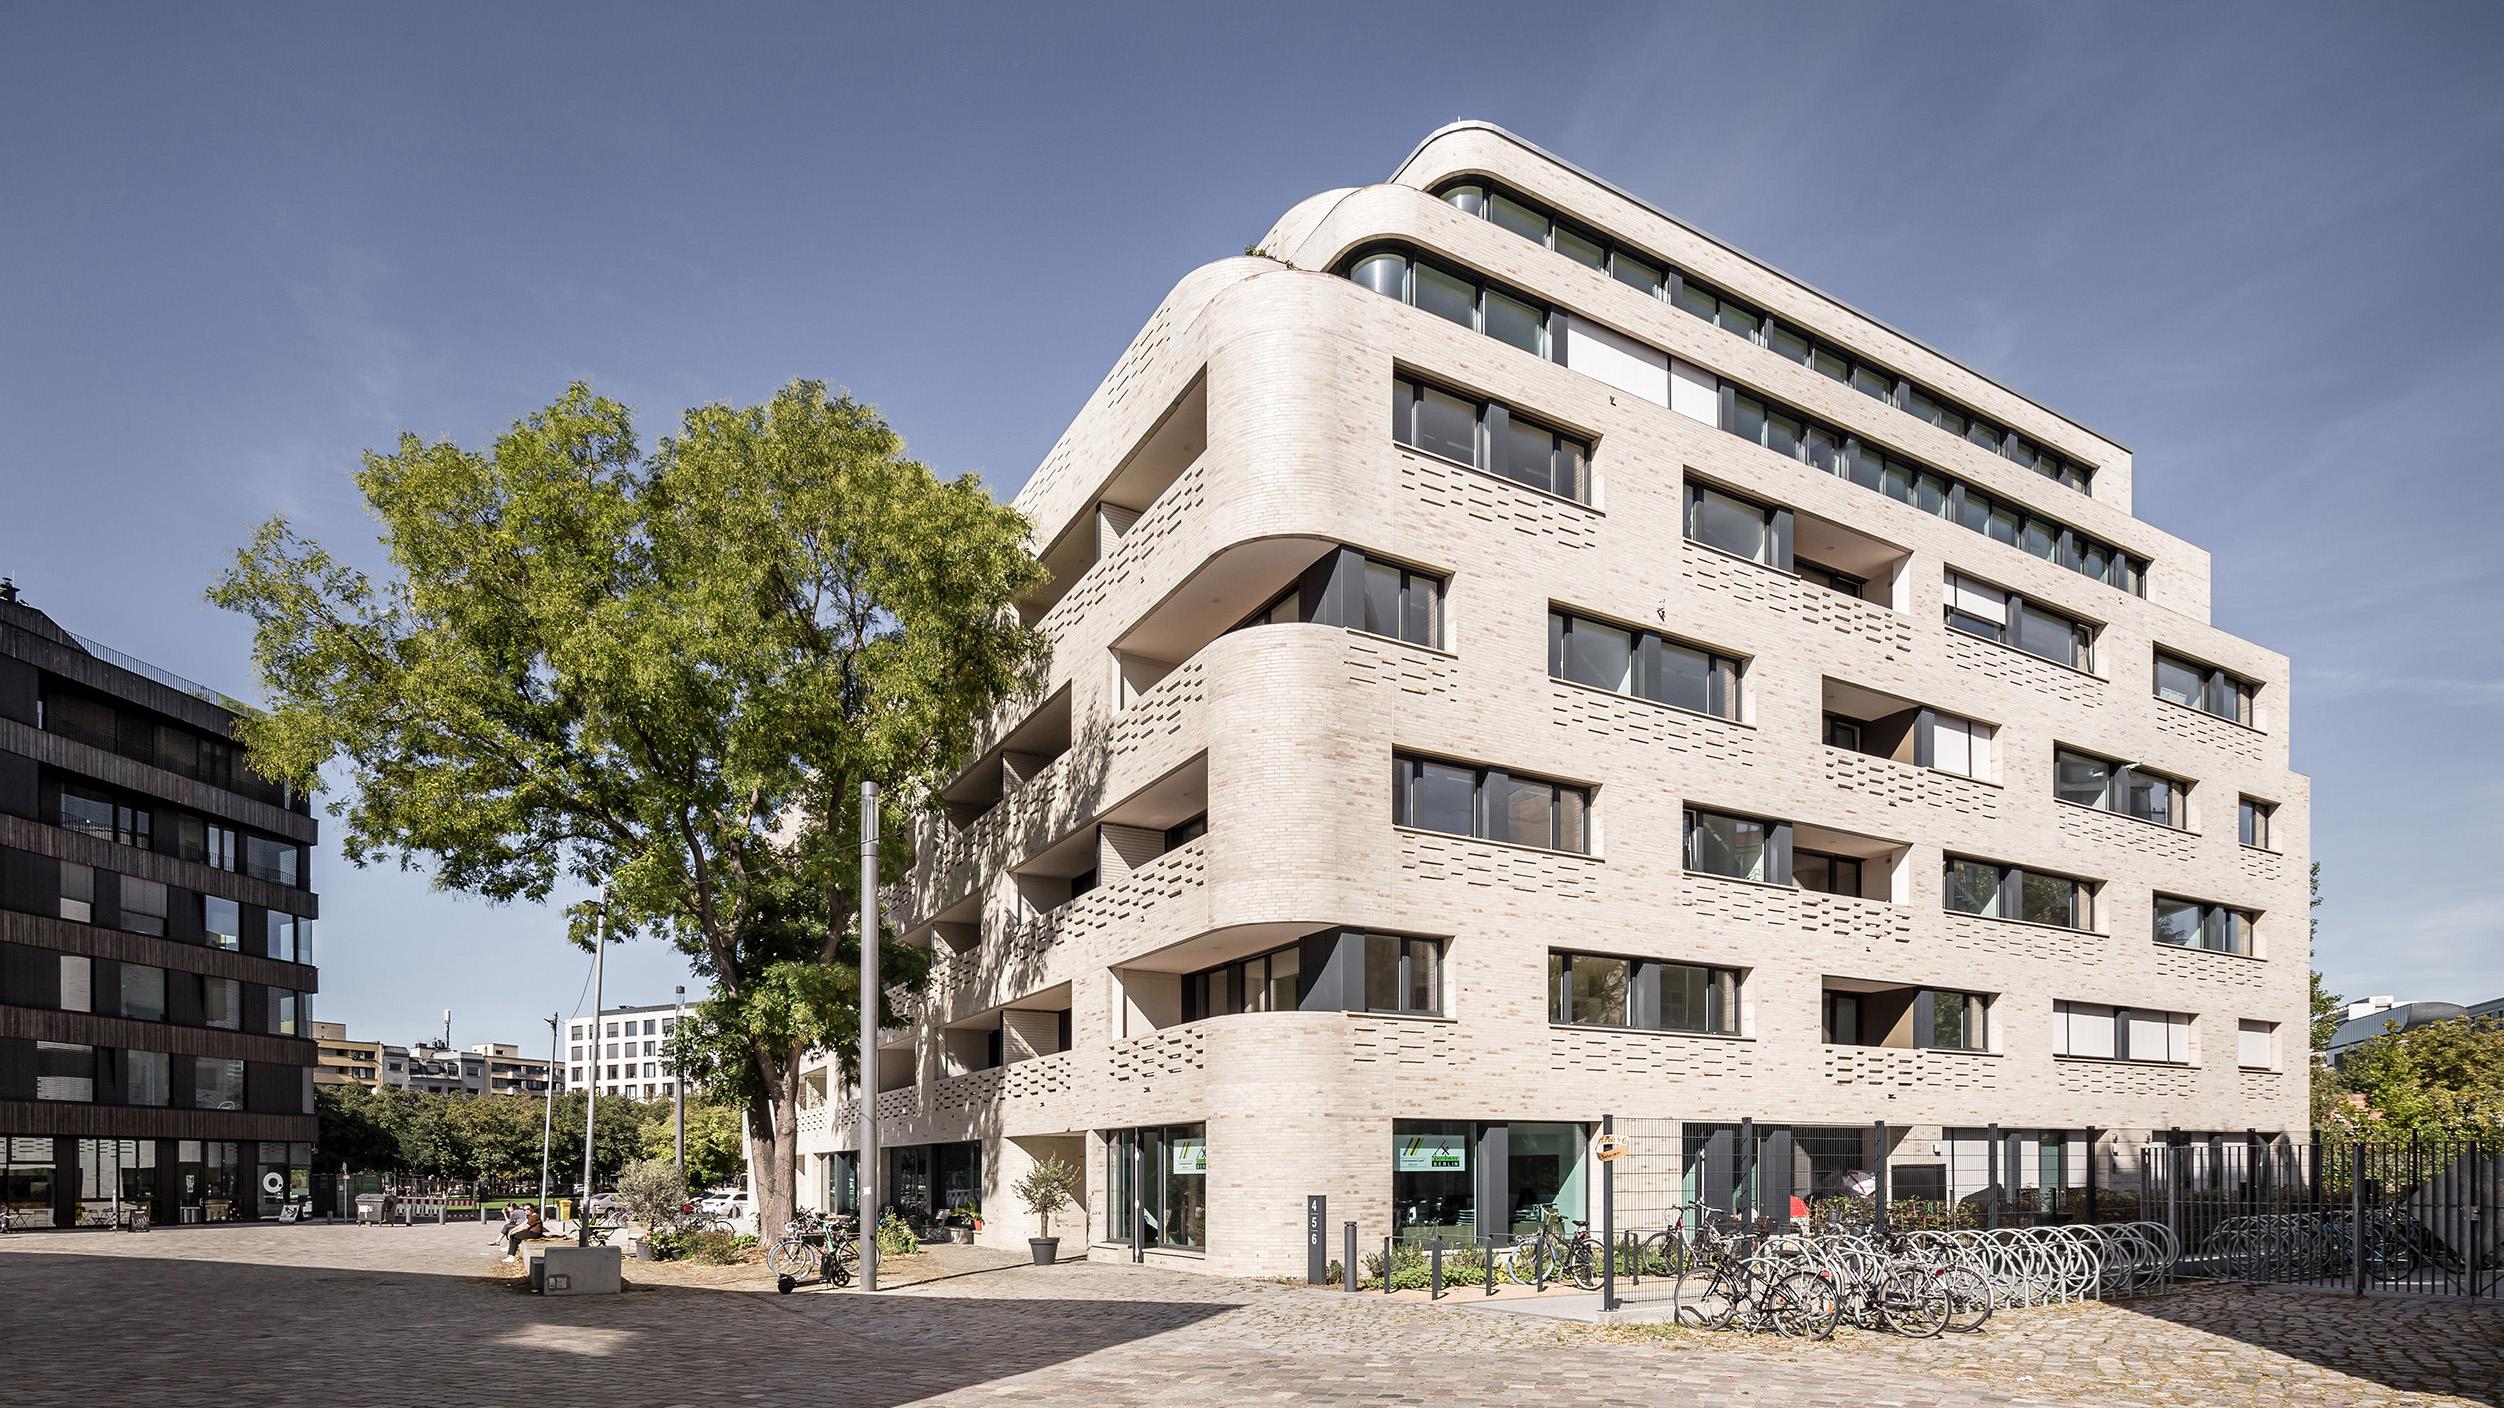 NeuHouse-Immobilie in Kreuzberg nun fertig und bewohnt